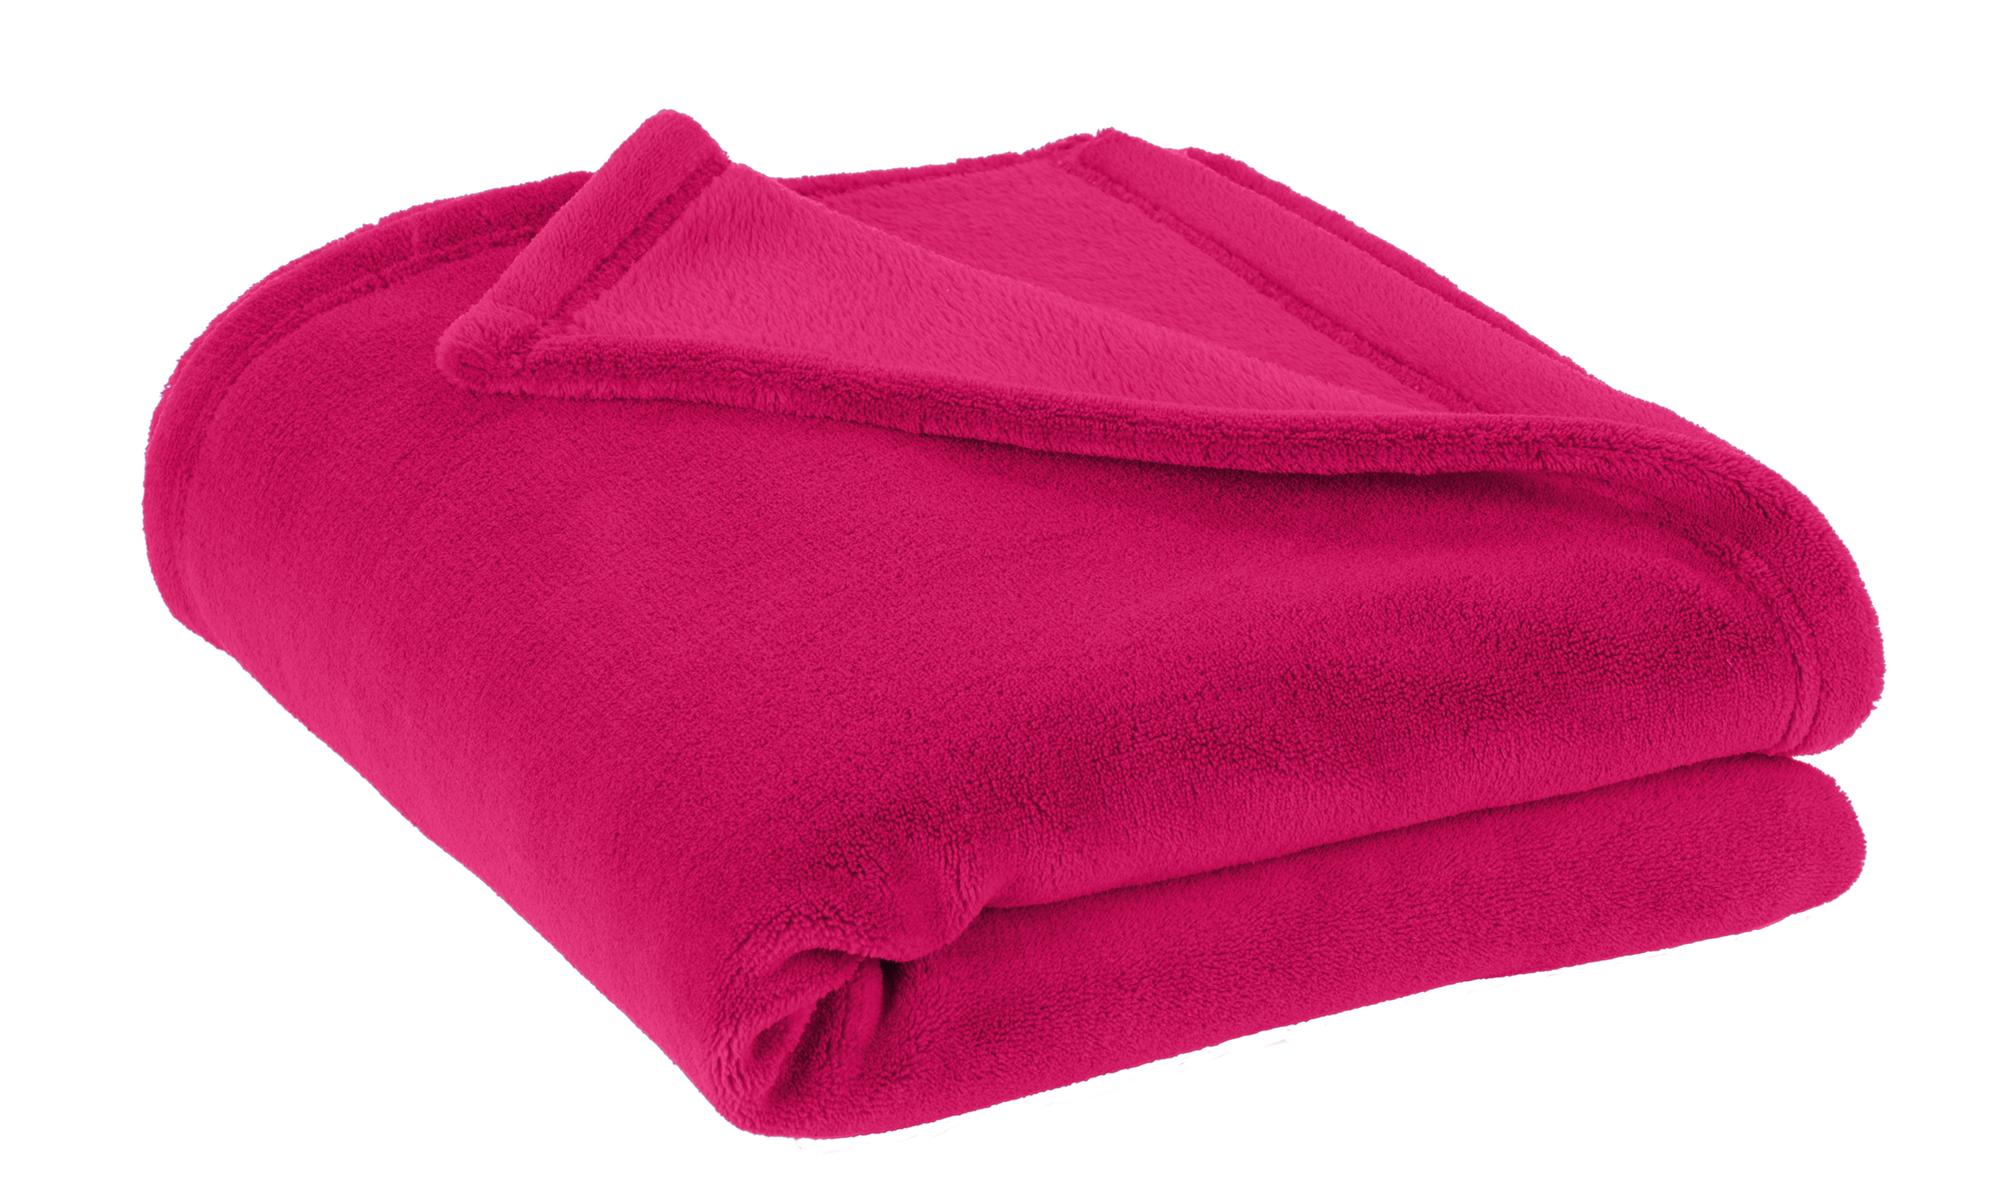 Blanket clipart - Clip...